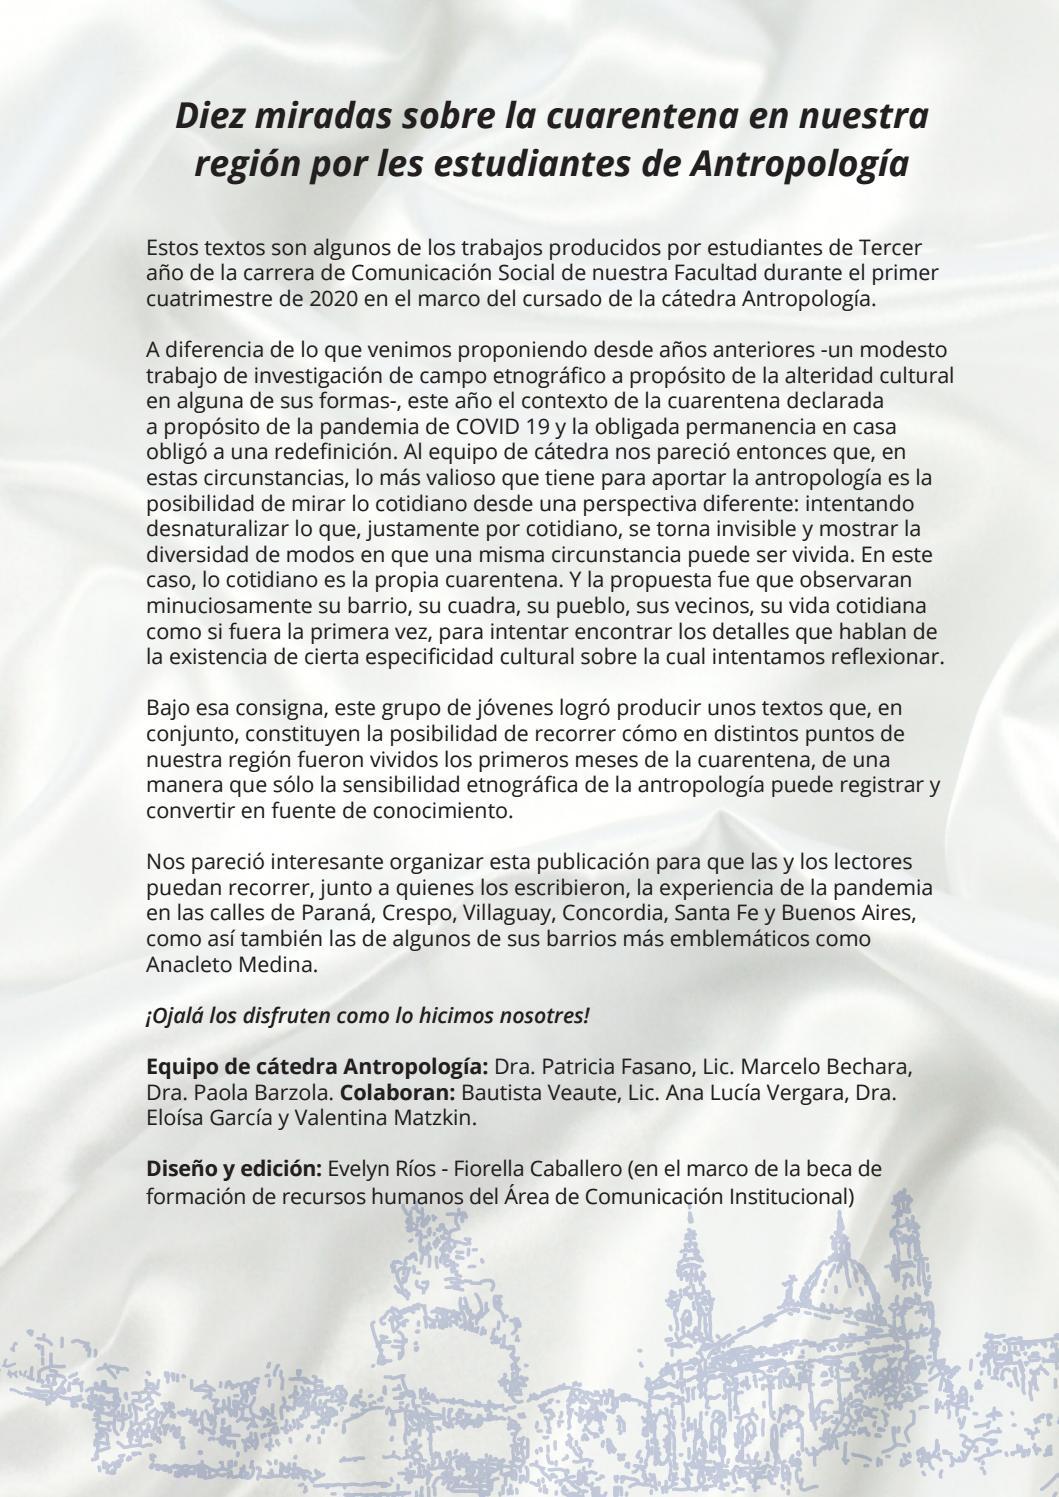 Etnografias De Cuarentena By Fcedu Uner Issuu